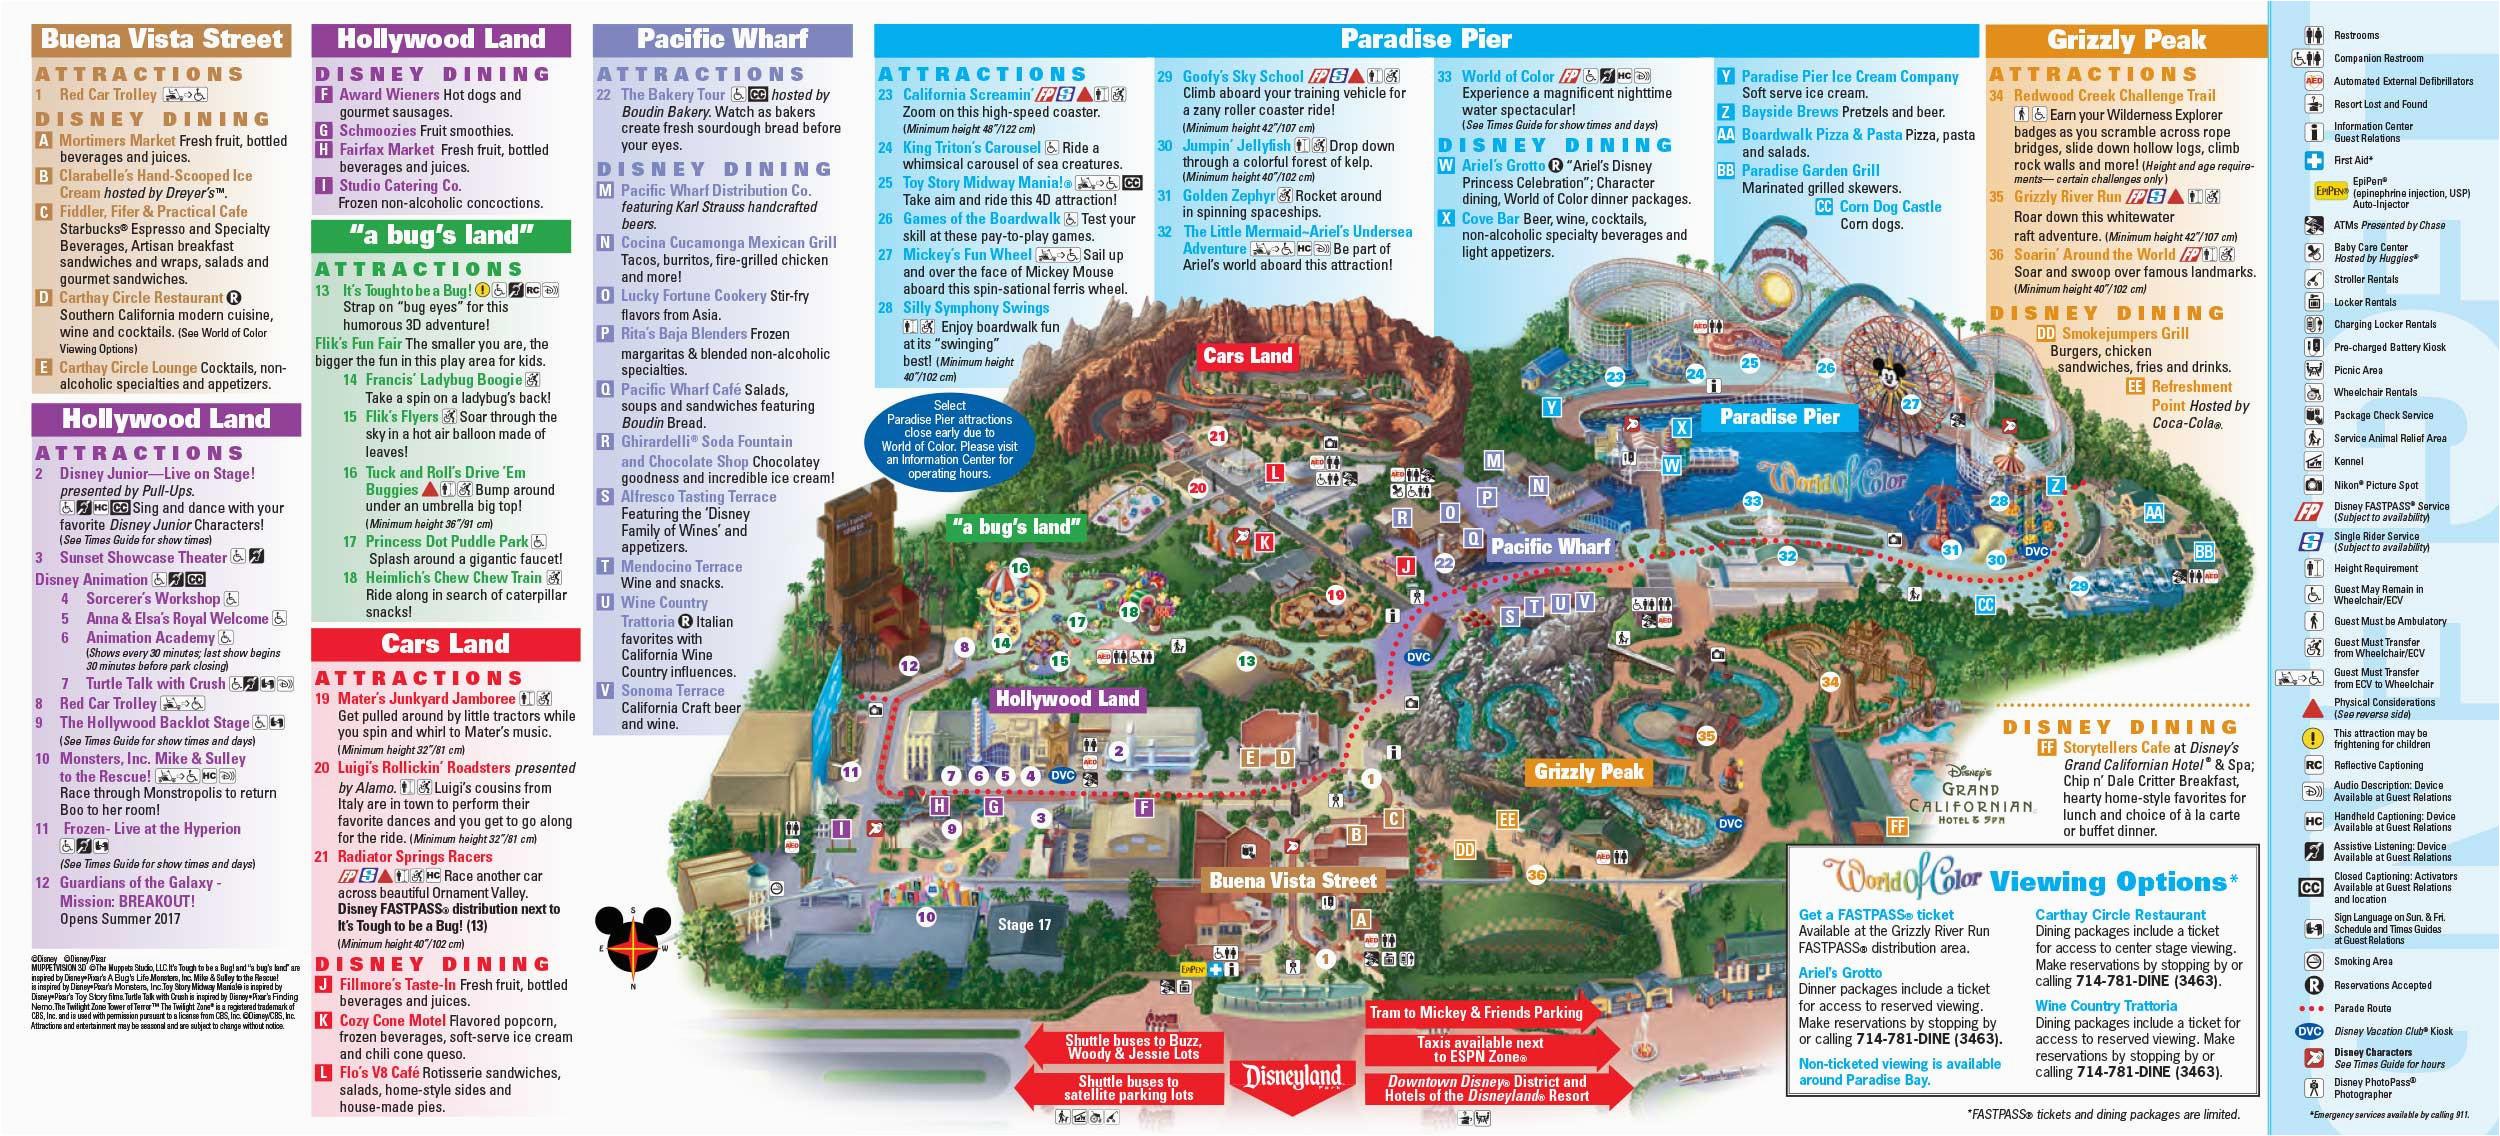 Disneyland California Adventure Map Map Of Disneyland and California Adventure Park Disneyland